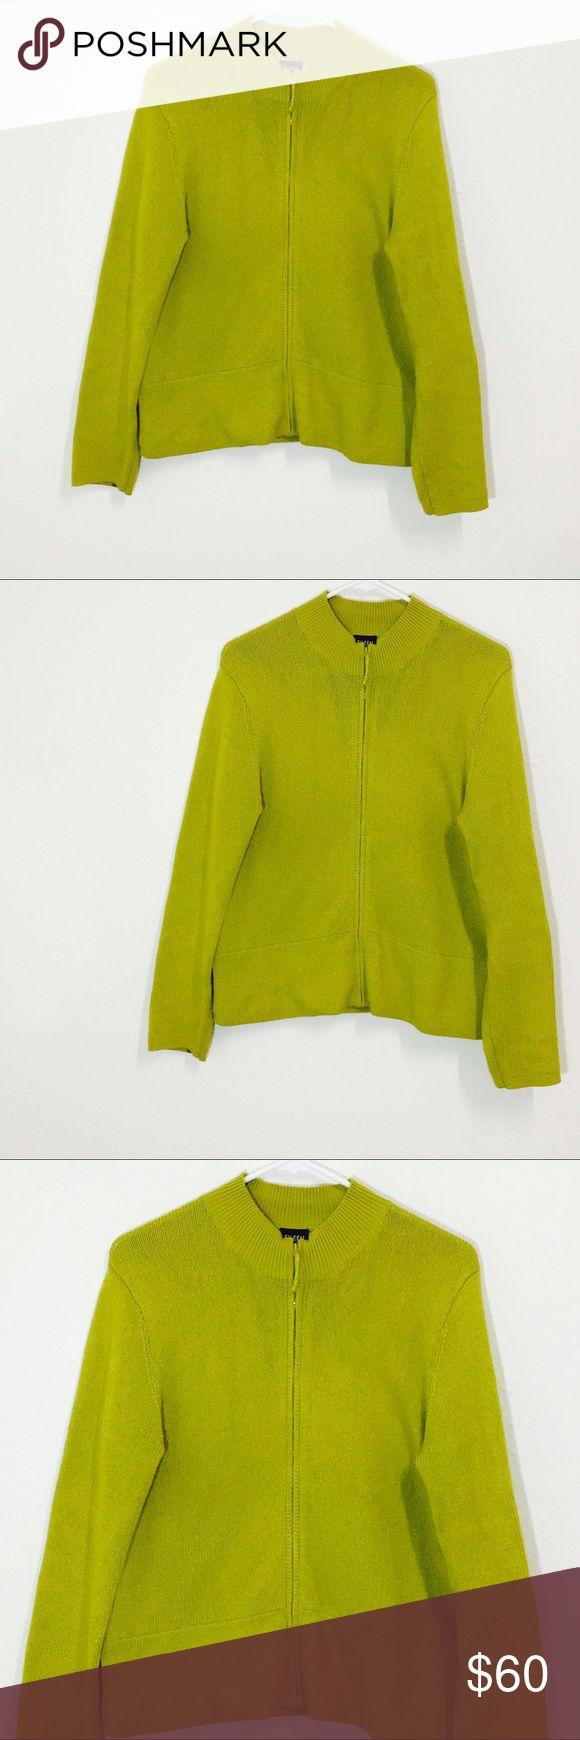 Eileen Fisher Bright Green Zip Up Knit Sweater! Size medium! Made of Italian yarn! Eileen Fisher Sweaters